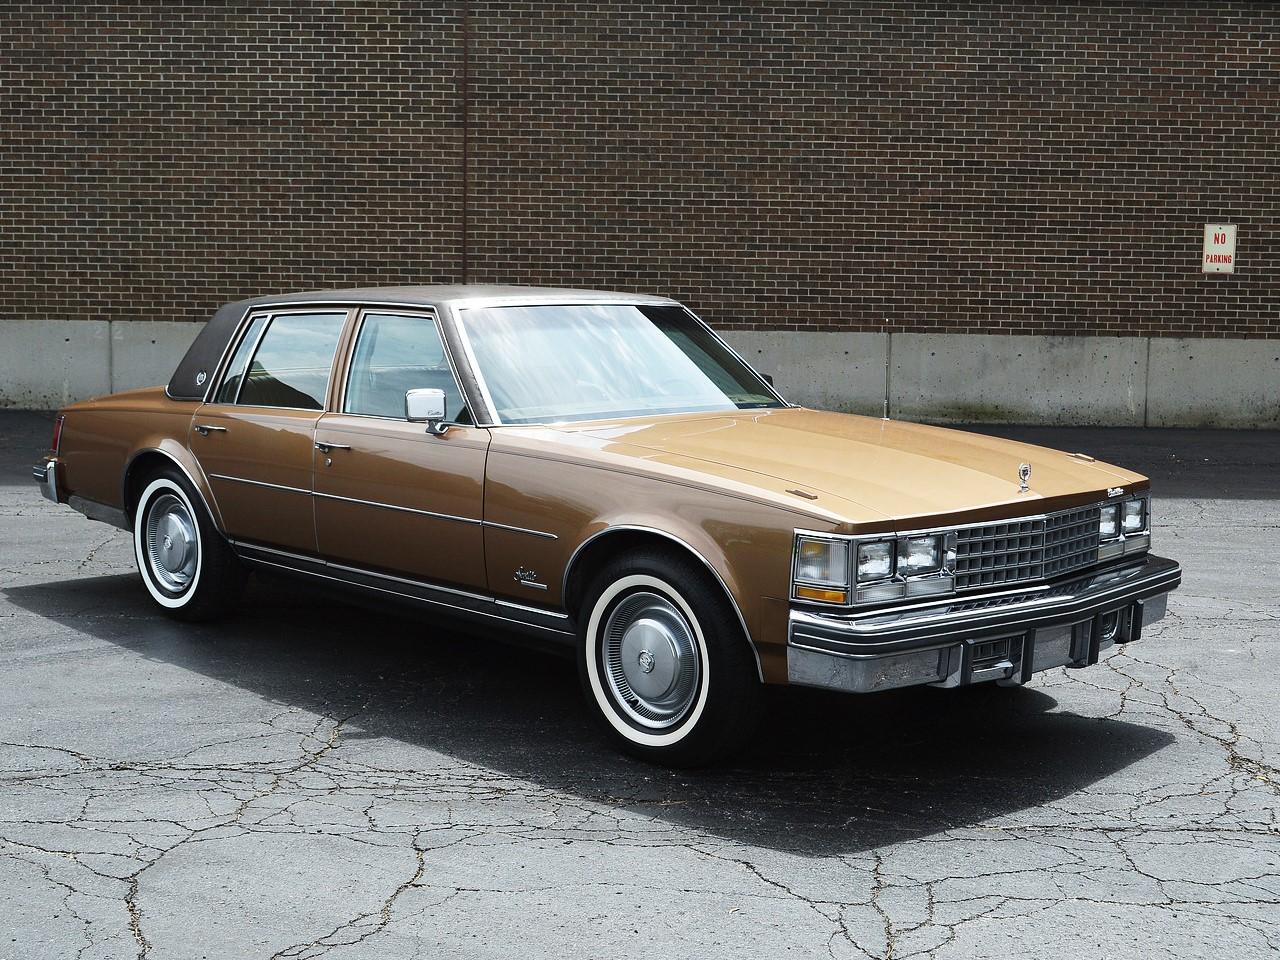 1976 Cadillac Seville 12